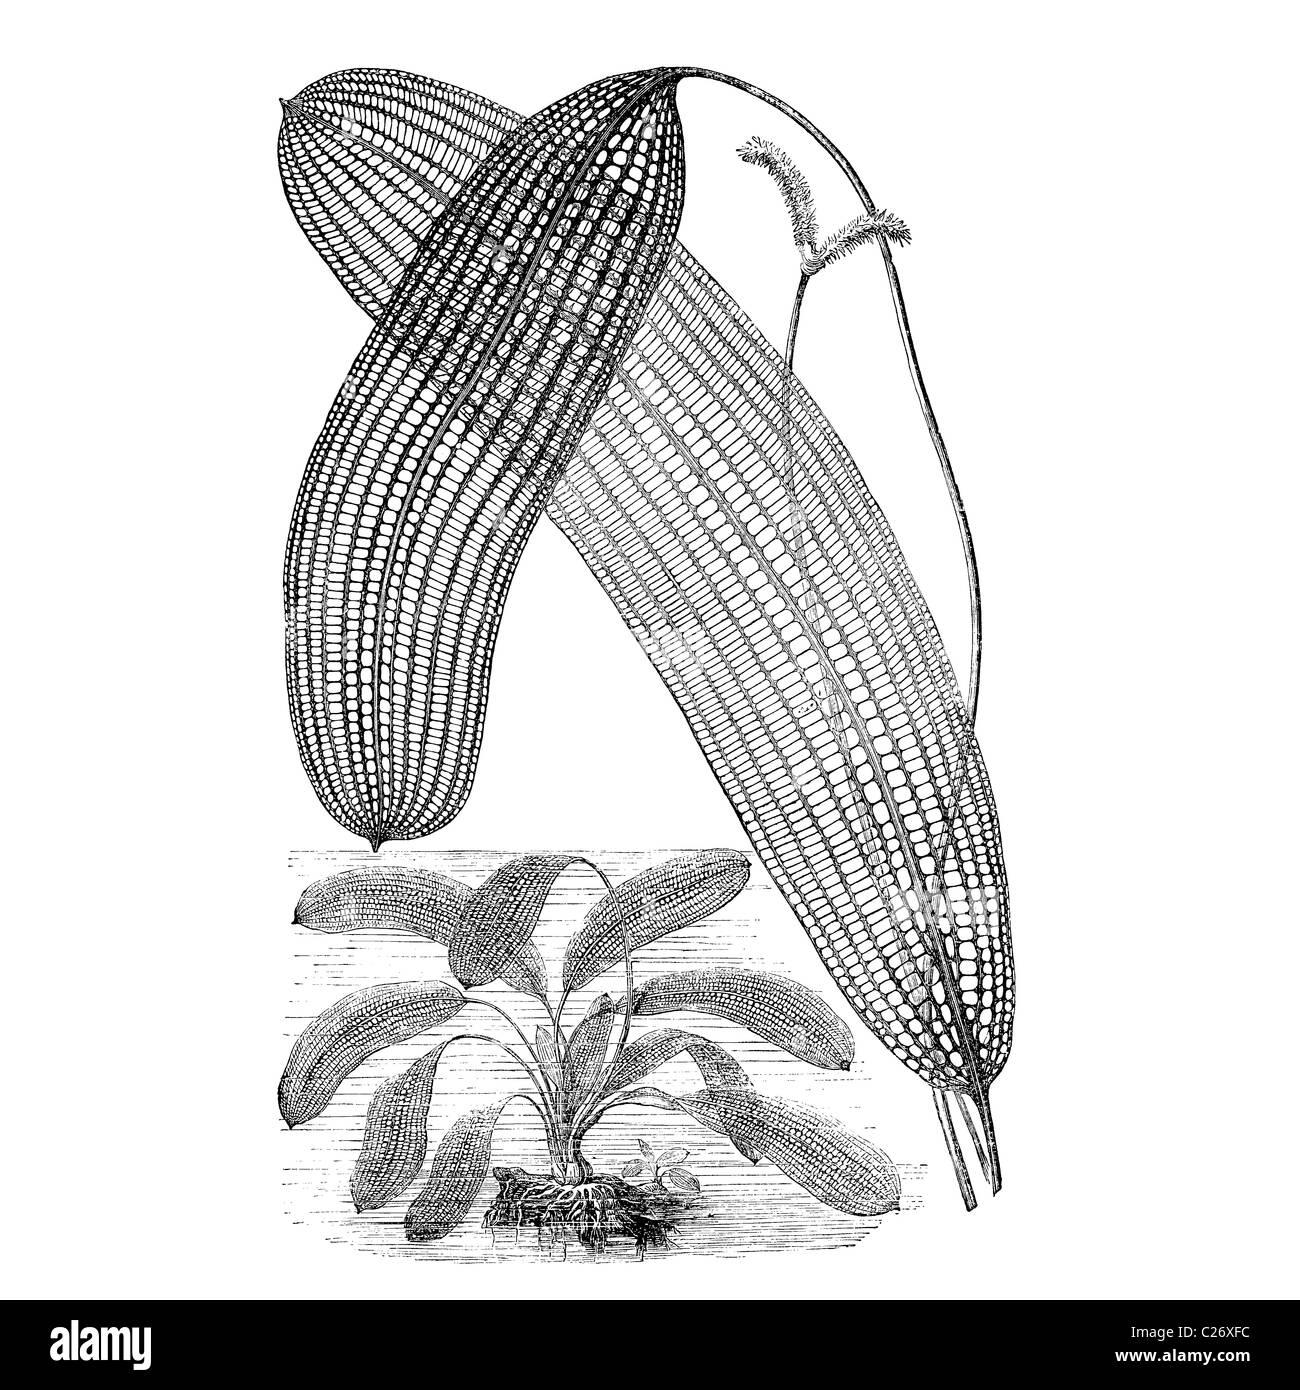 Lattice Leaf Plant, Ouvirandra fenestralis, Victoria engraving, 19th century illustration - Stock Image